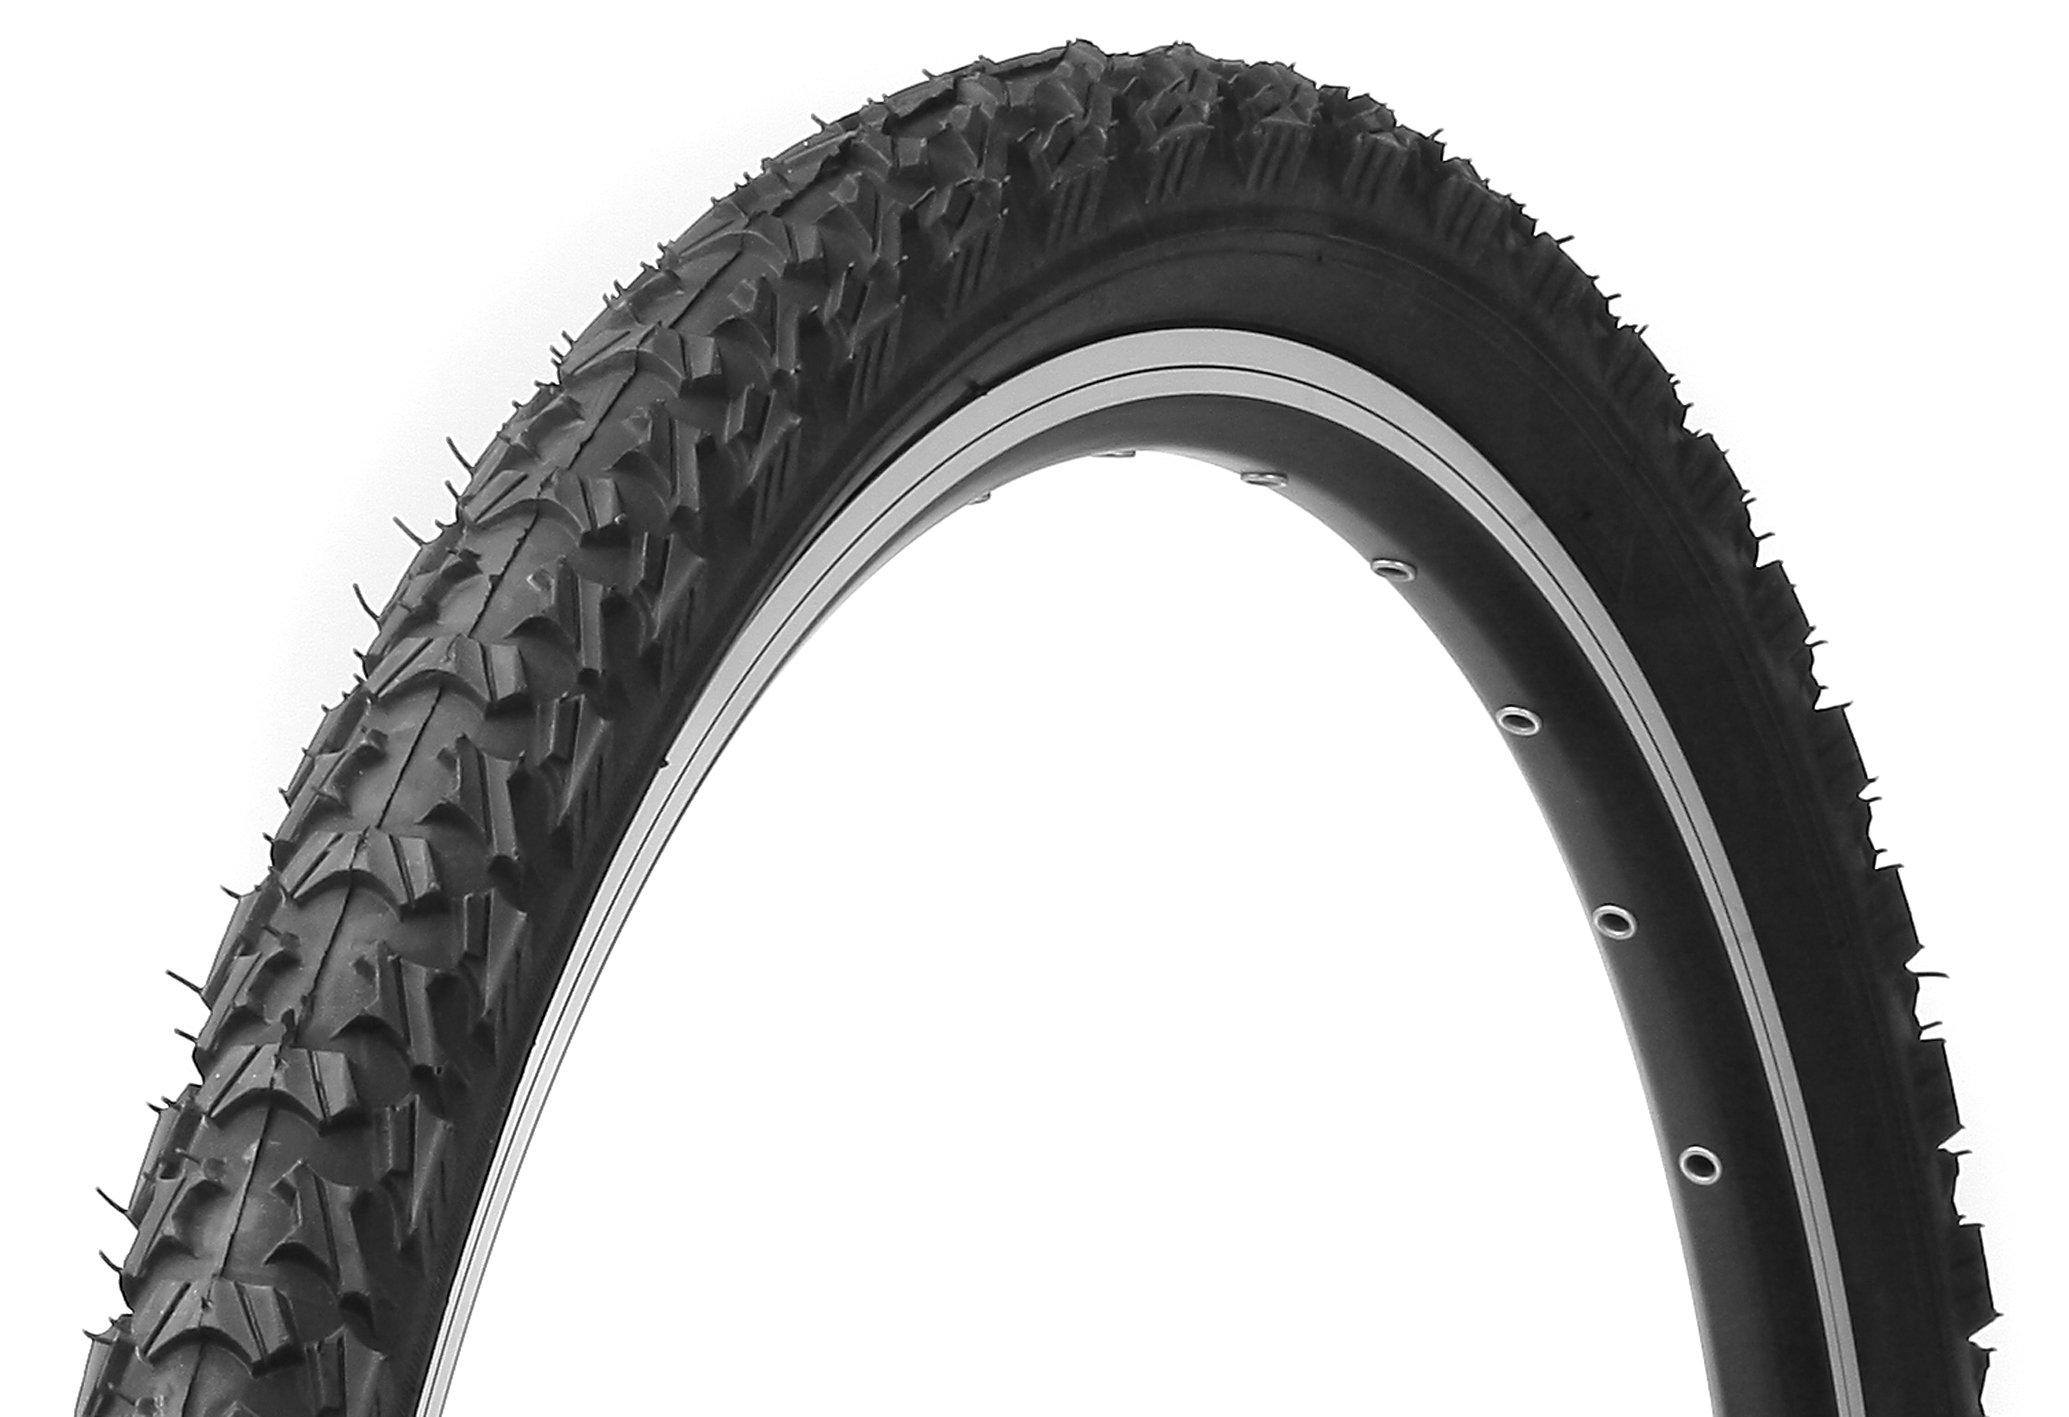 VEE RUBBER - Външна гума Vee Rubber 24x1,95 VRB103